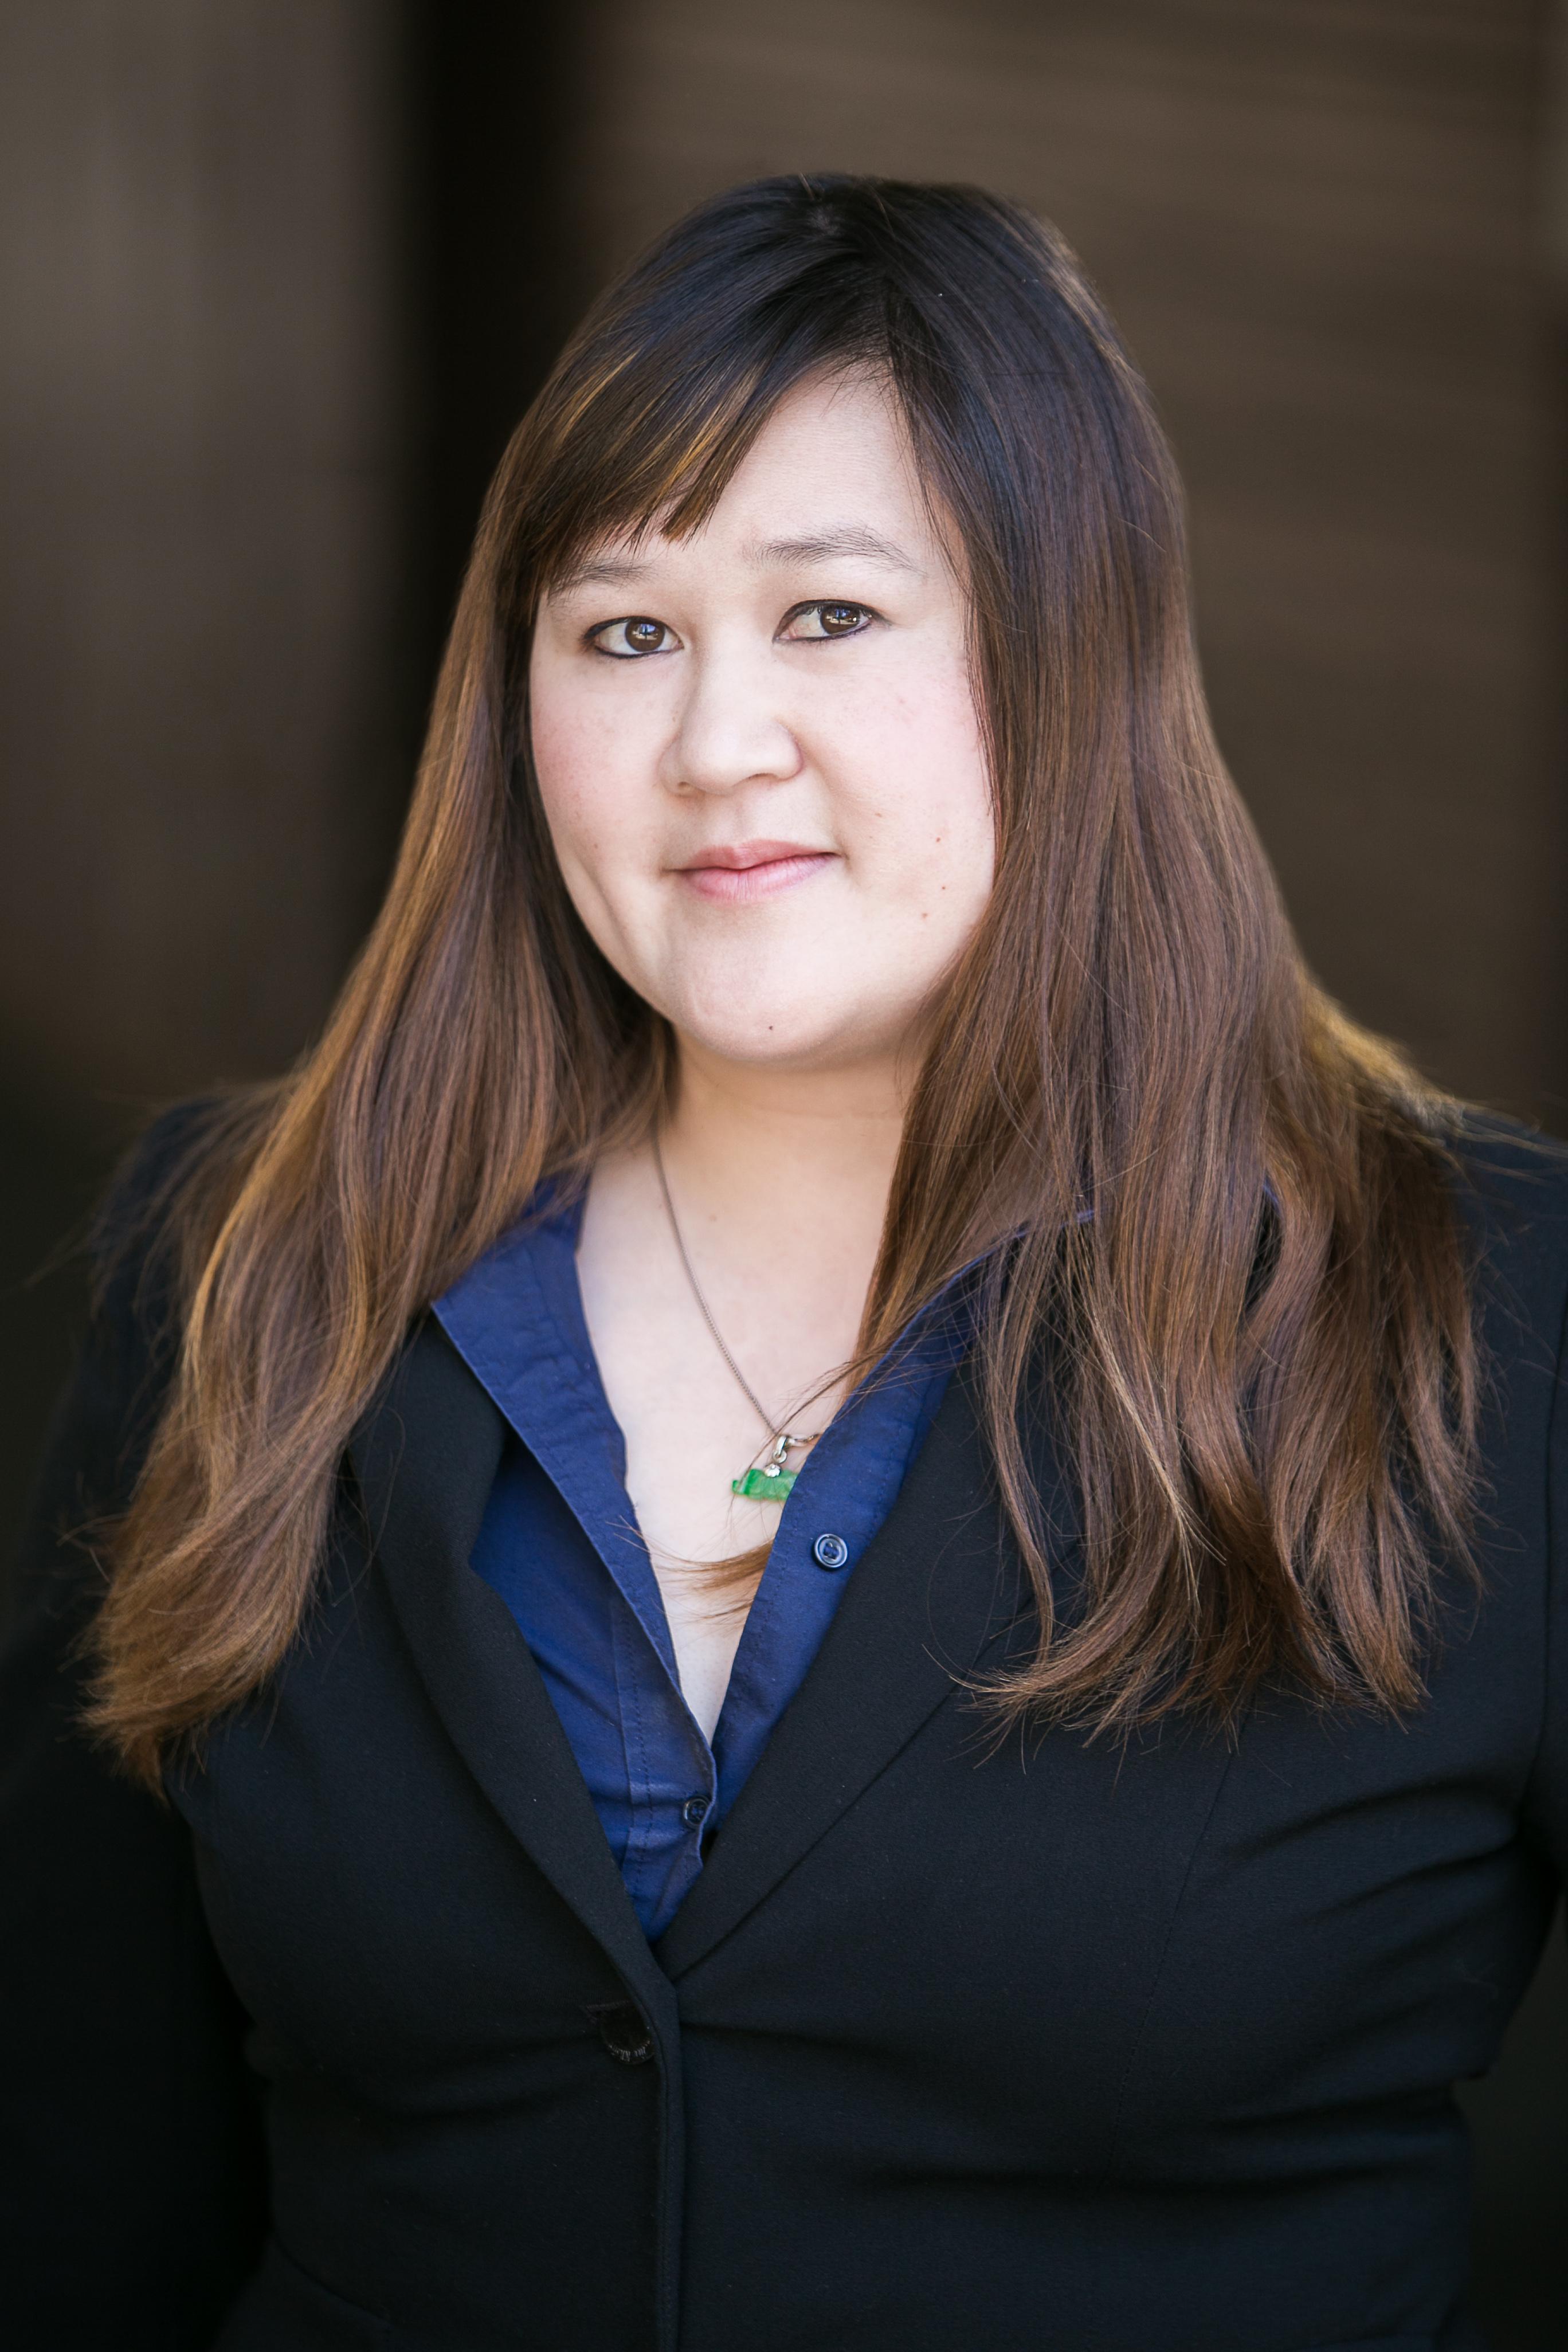 Tiffany N. Smith-Nguyen